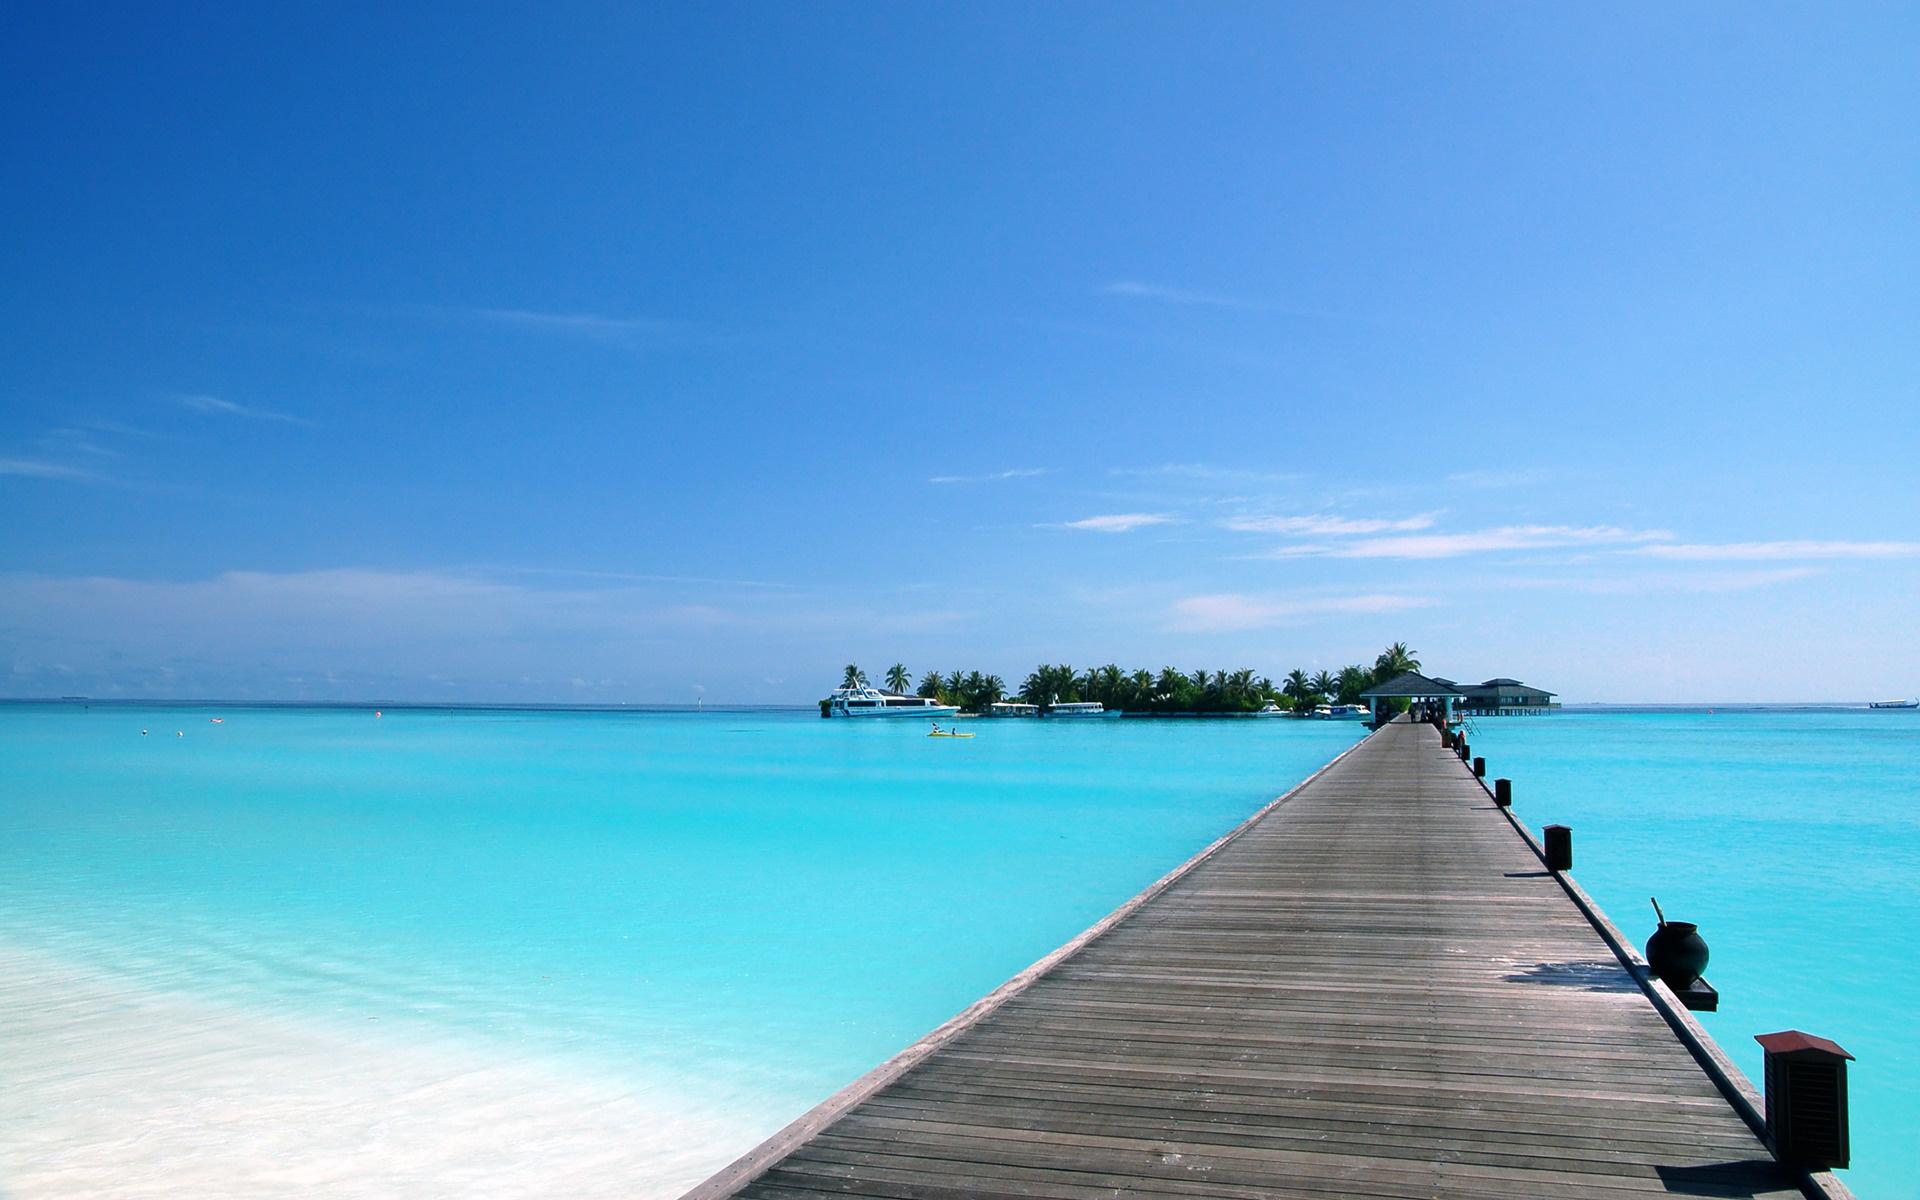 лето, тропики, океан